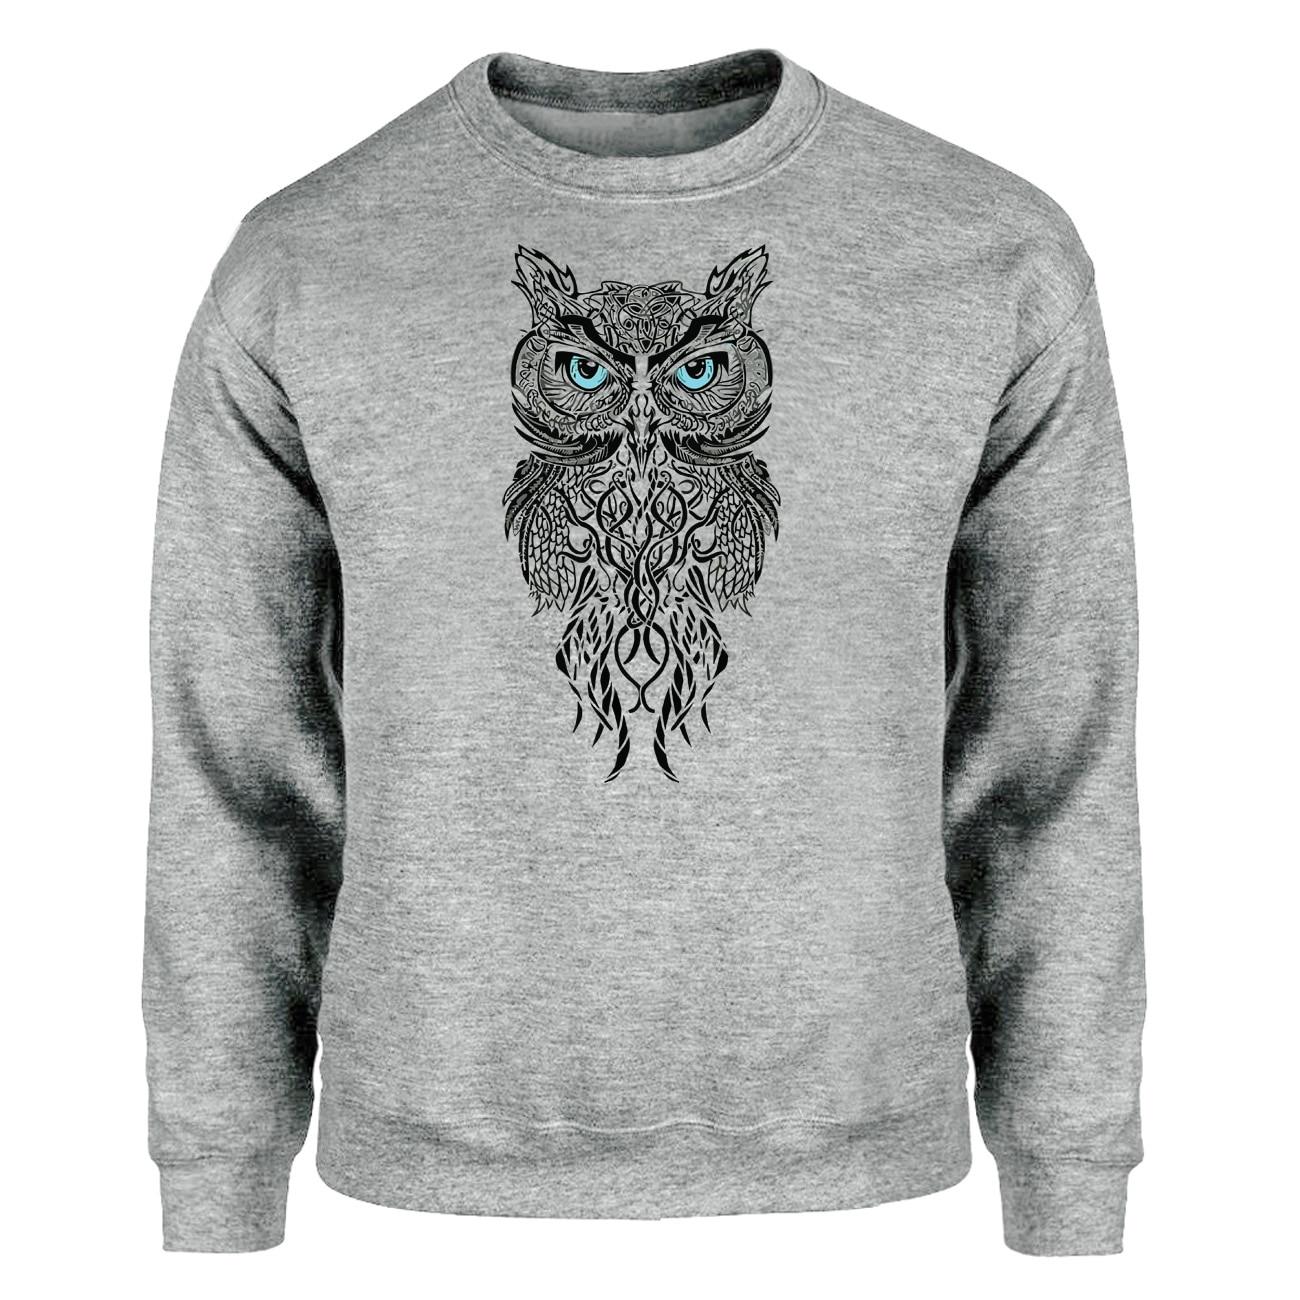 Animal Owl Hoodies Men Sweatshirts Ancient Crewneck Sweatshirt Hoodie Winter Autumn Fleece Warm Vintage Symbol Sportswear Mens